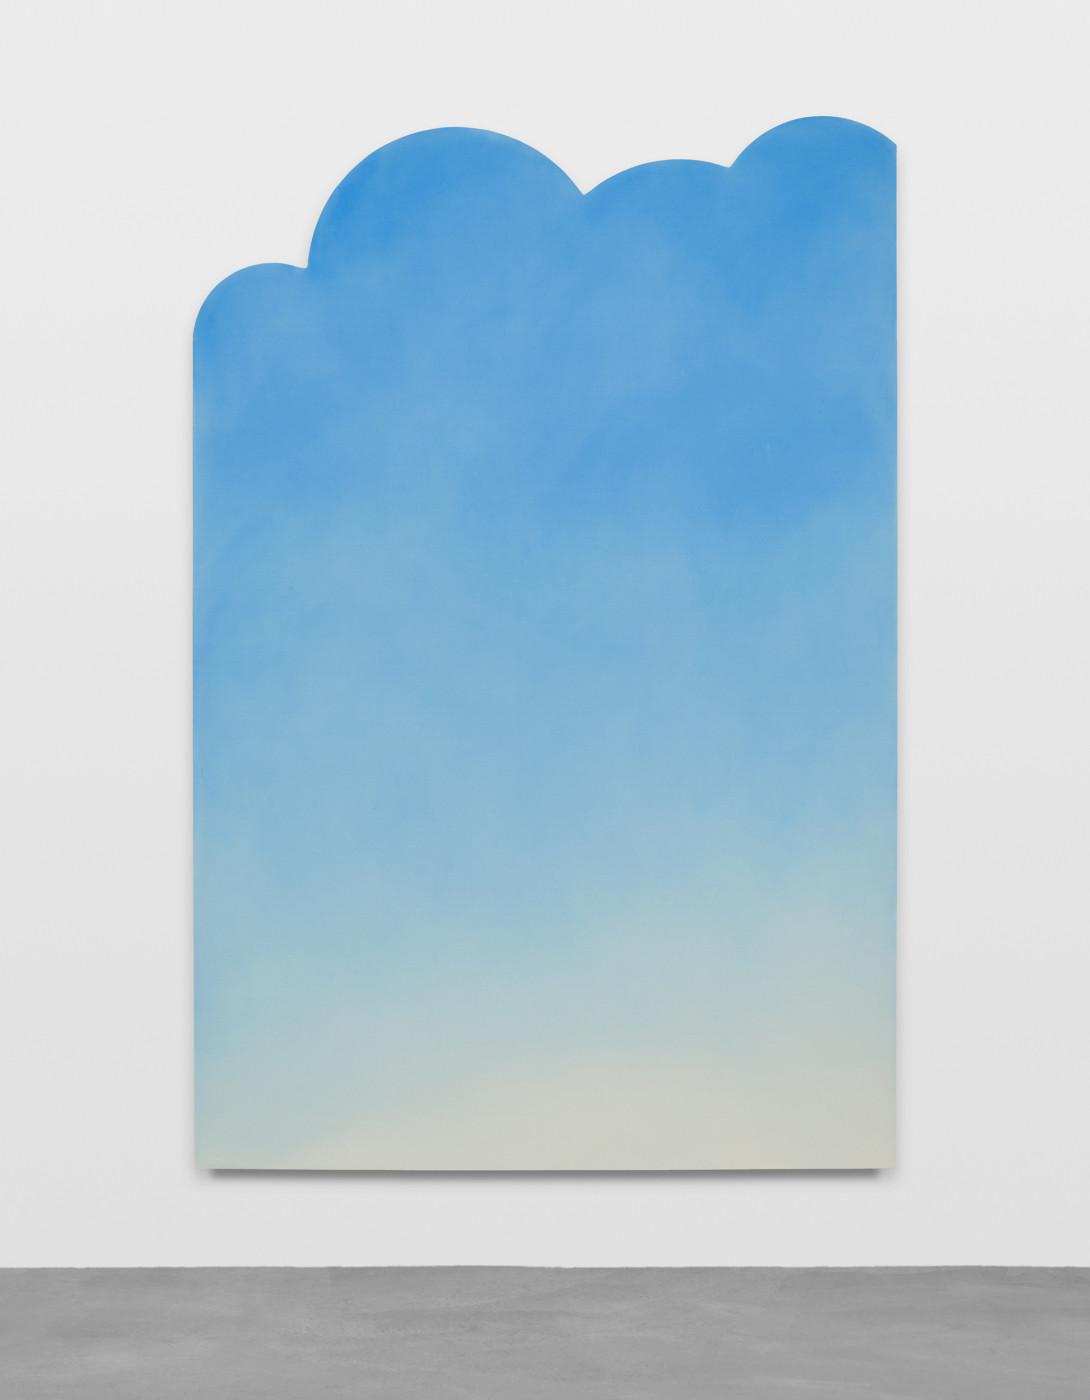 "<div class=""title""><em>neunundzwanzigsterjunizweitausendundfünfzehn</em>, 2015</div><div class=""medium"">acrylic on canvas, plexiplaque with labeling</div><div class=""dimensions"">270.0 x 180.0 x 4.2 cm<br />106 1/4 x 70 13/16 x 1 5/8 in.</div>"